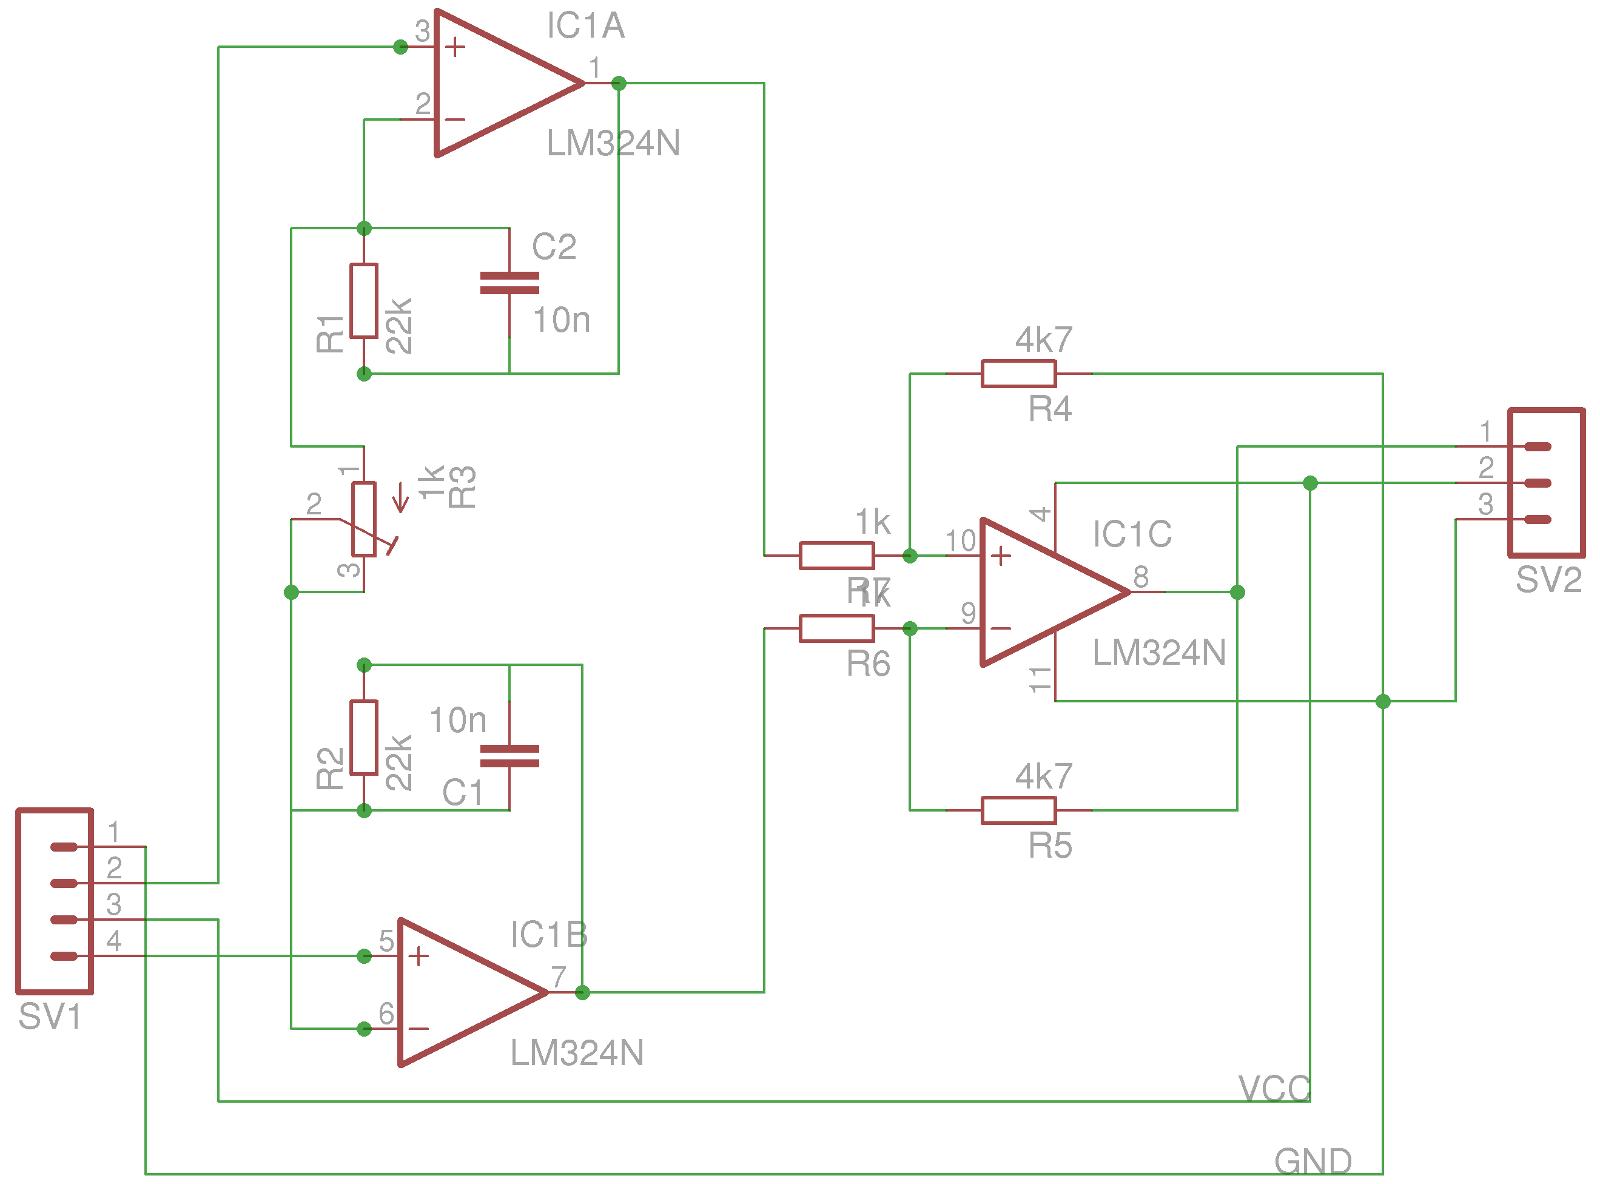 hight resolution of interfacing pressure transducer circuit transducer circuit diagram wiring diagram as well as water depth pressure sensor